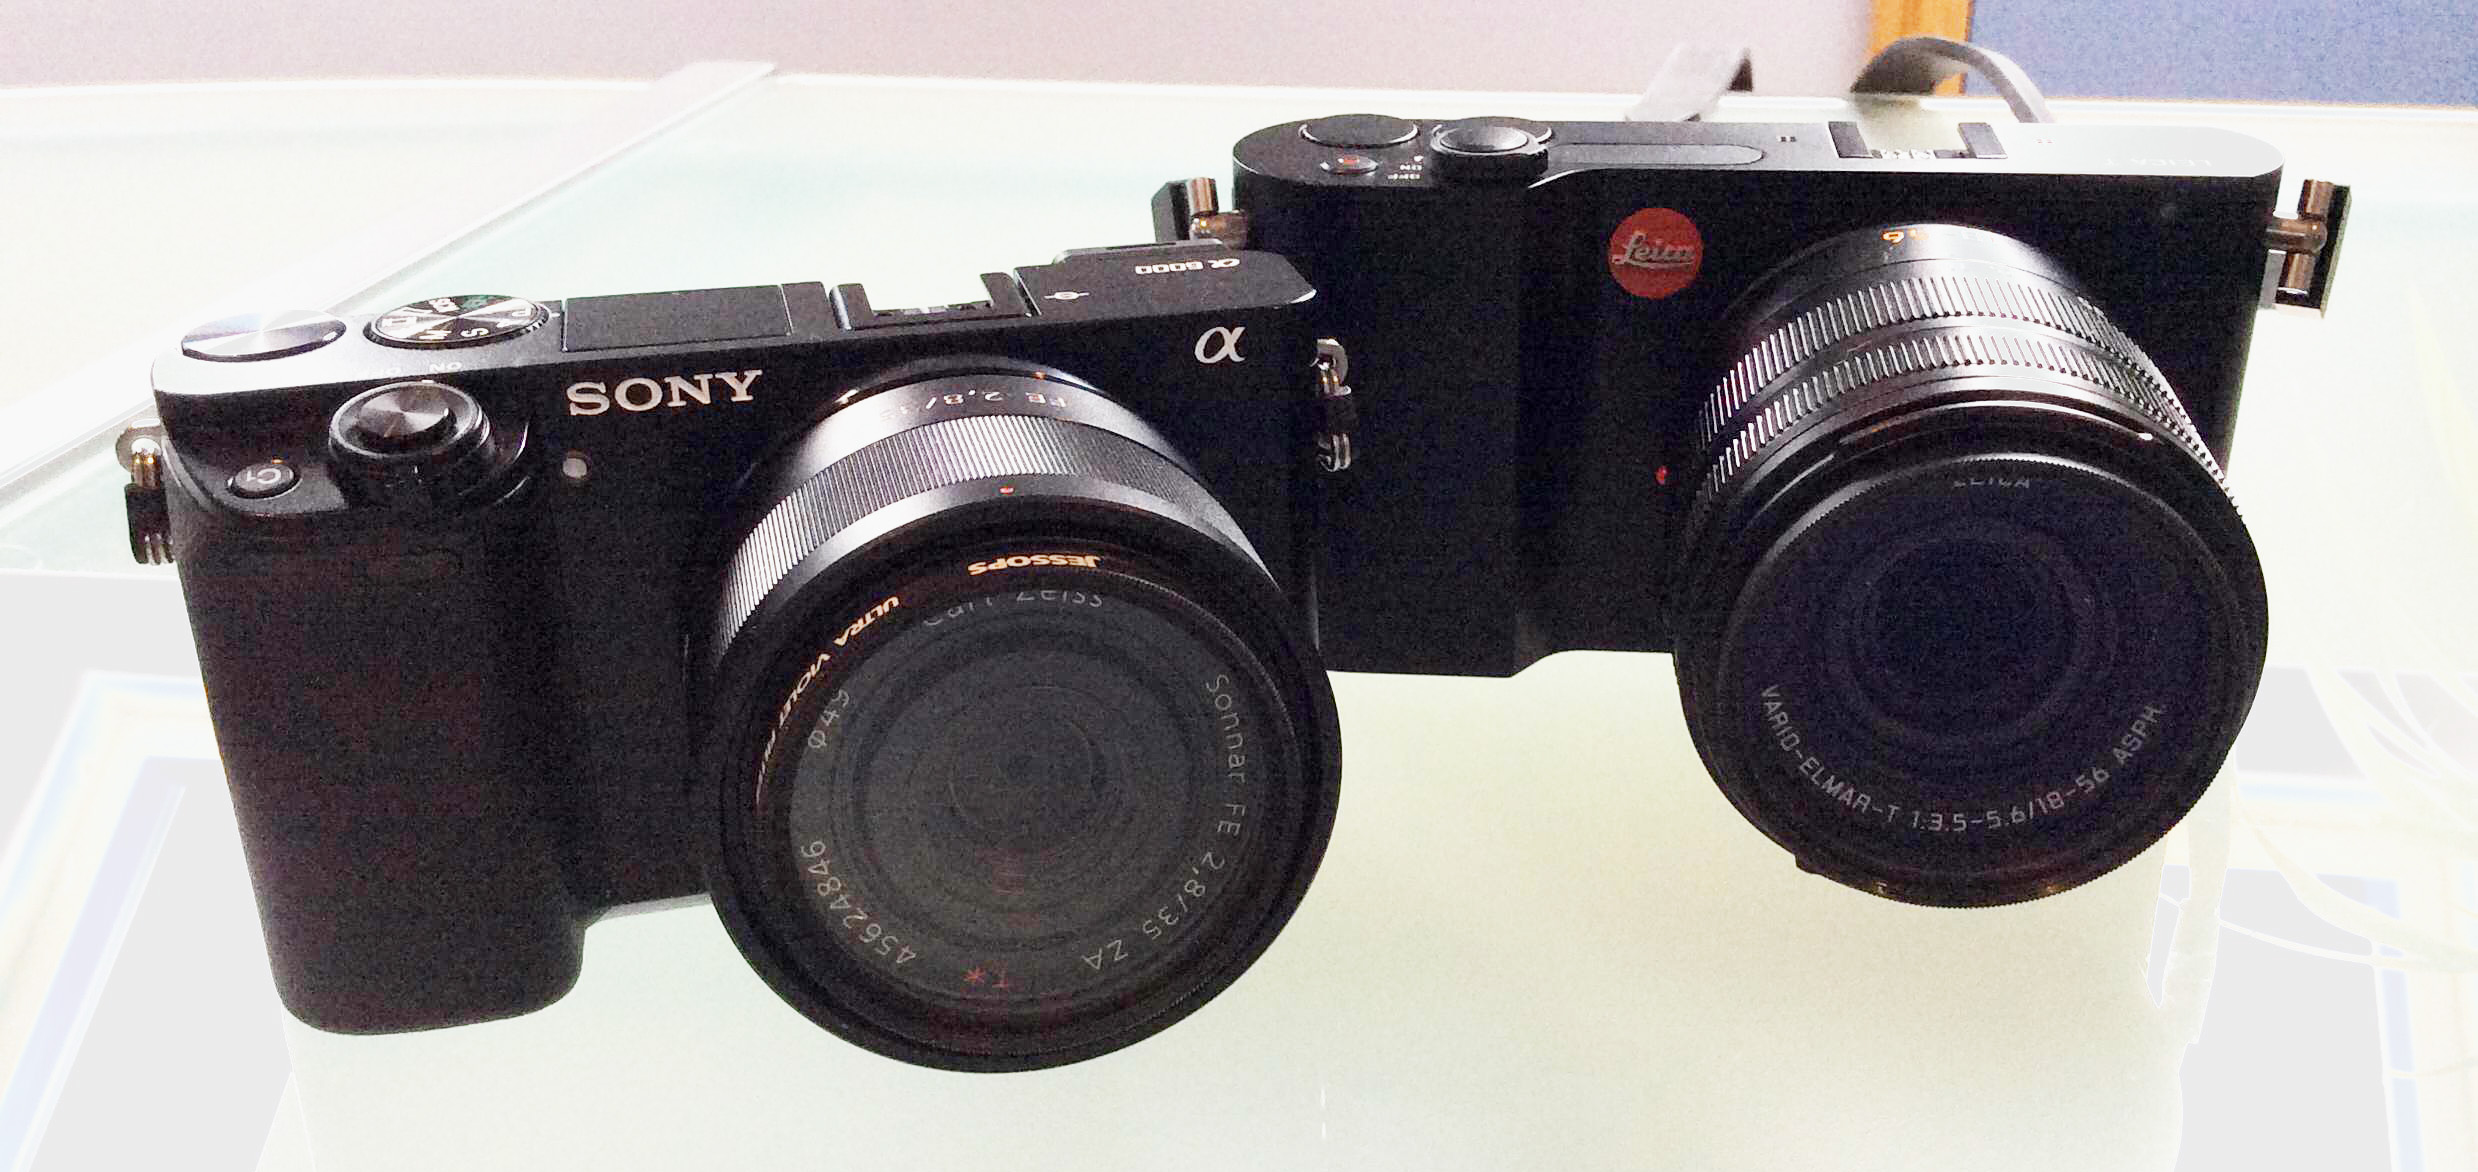 Sony a6000,Sony SEL55F18Z E-mount Carl Zeiss Full Frame Prime Lens,Leica T (Typ 701)